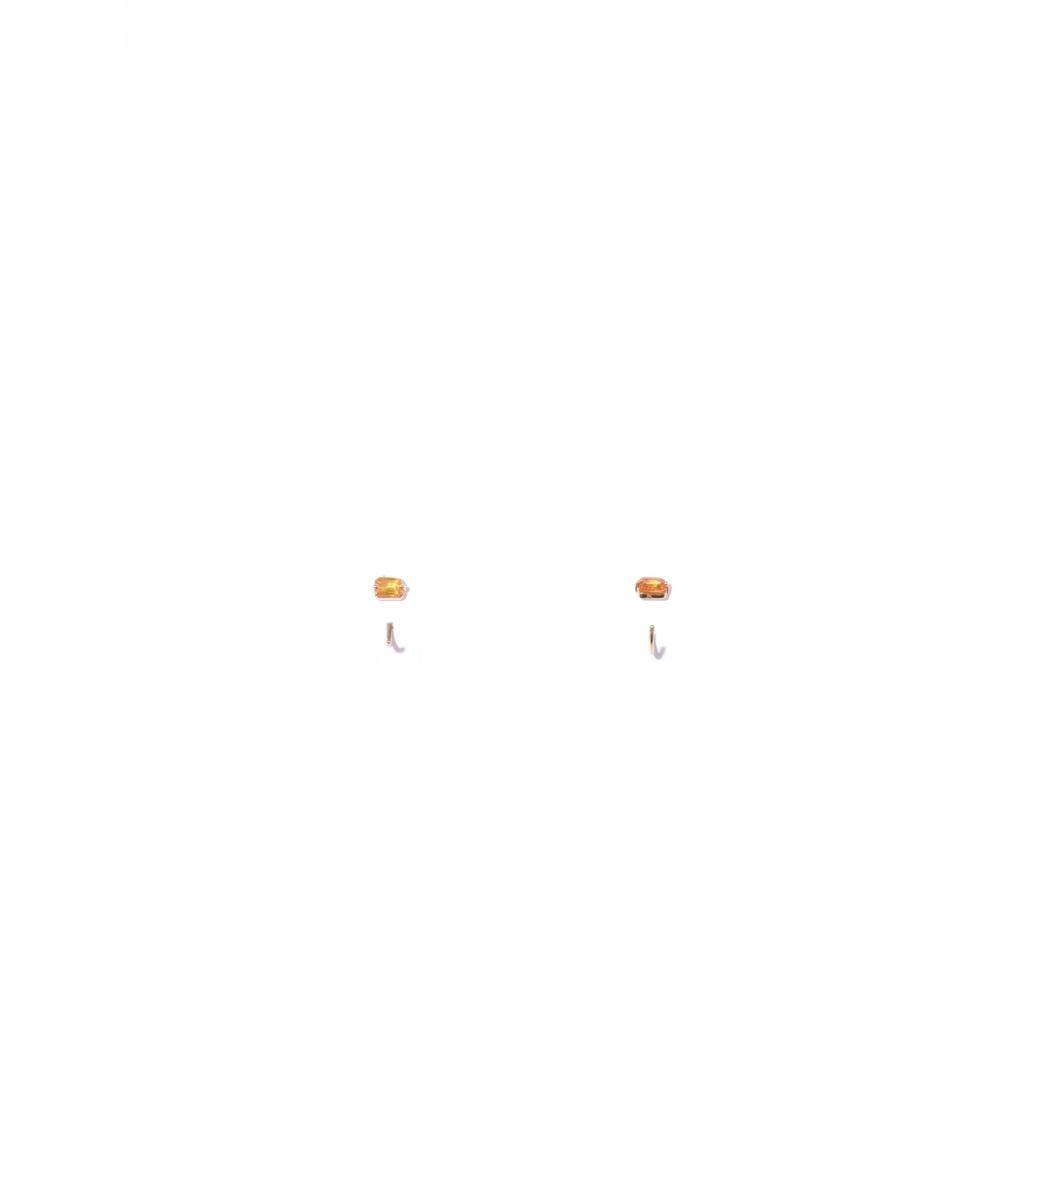 THEODOSIA Orange Sapphire Half Hoops